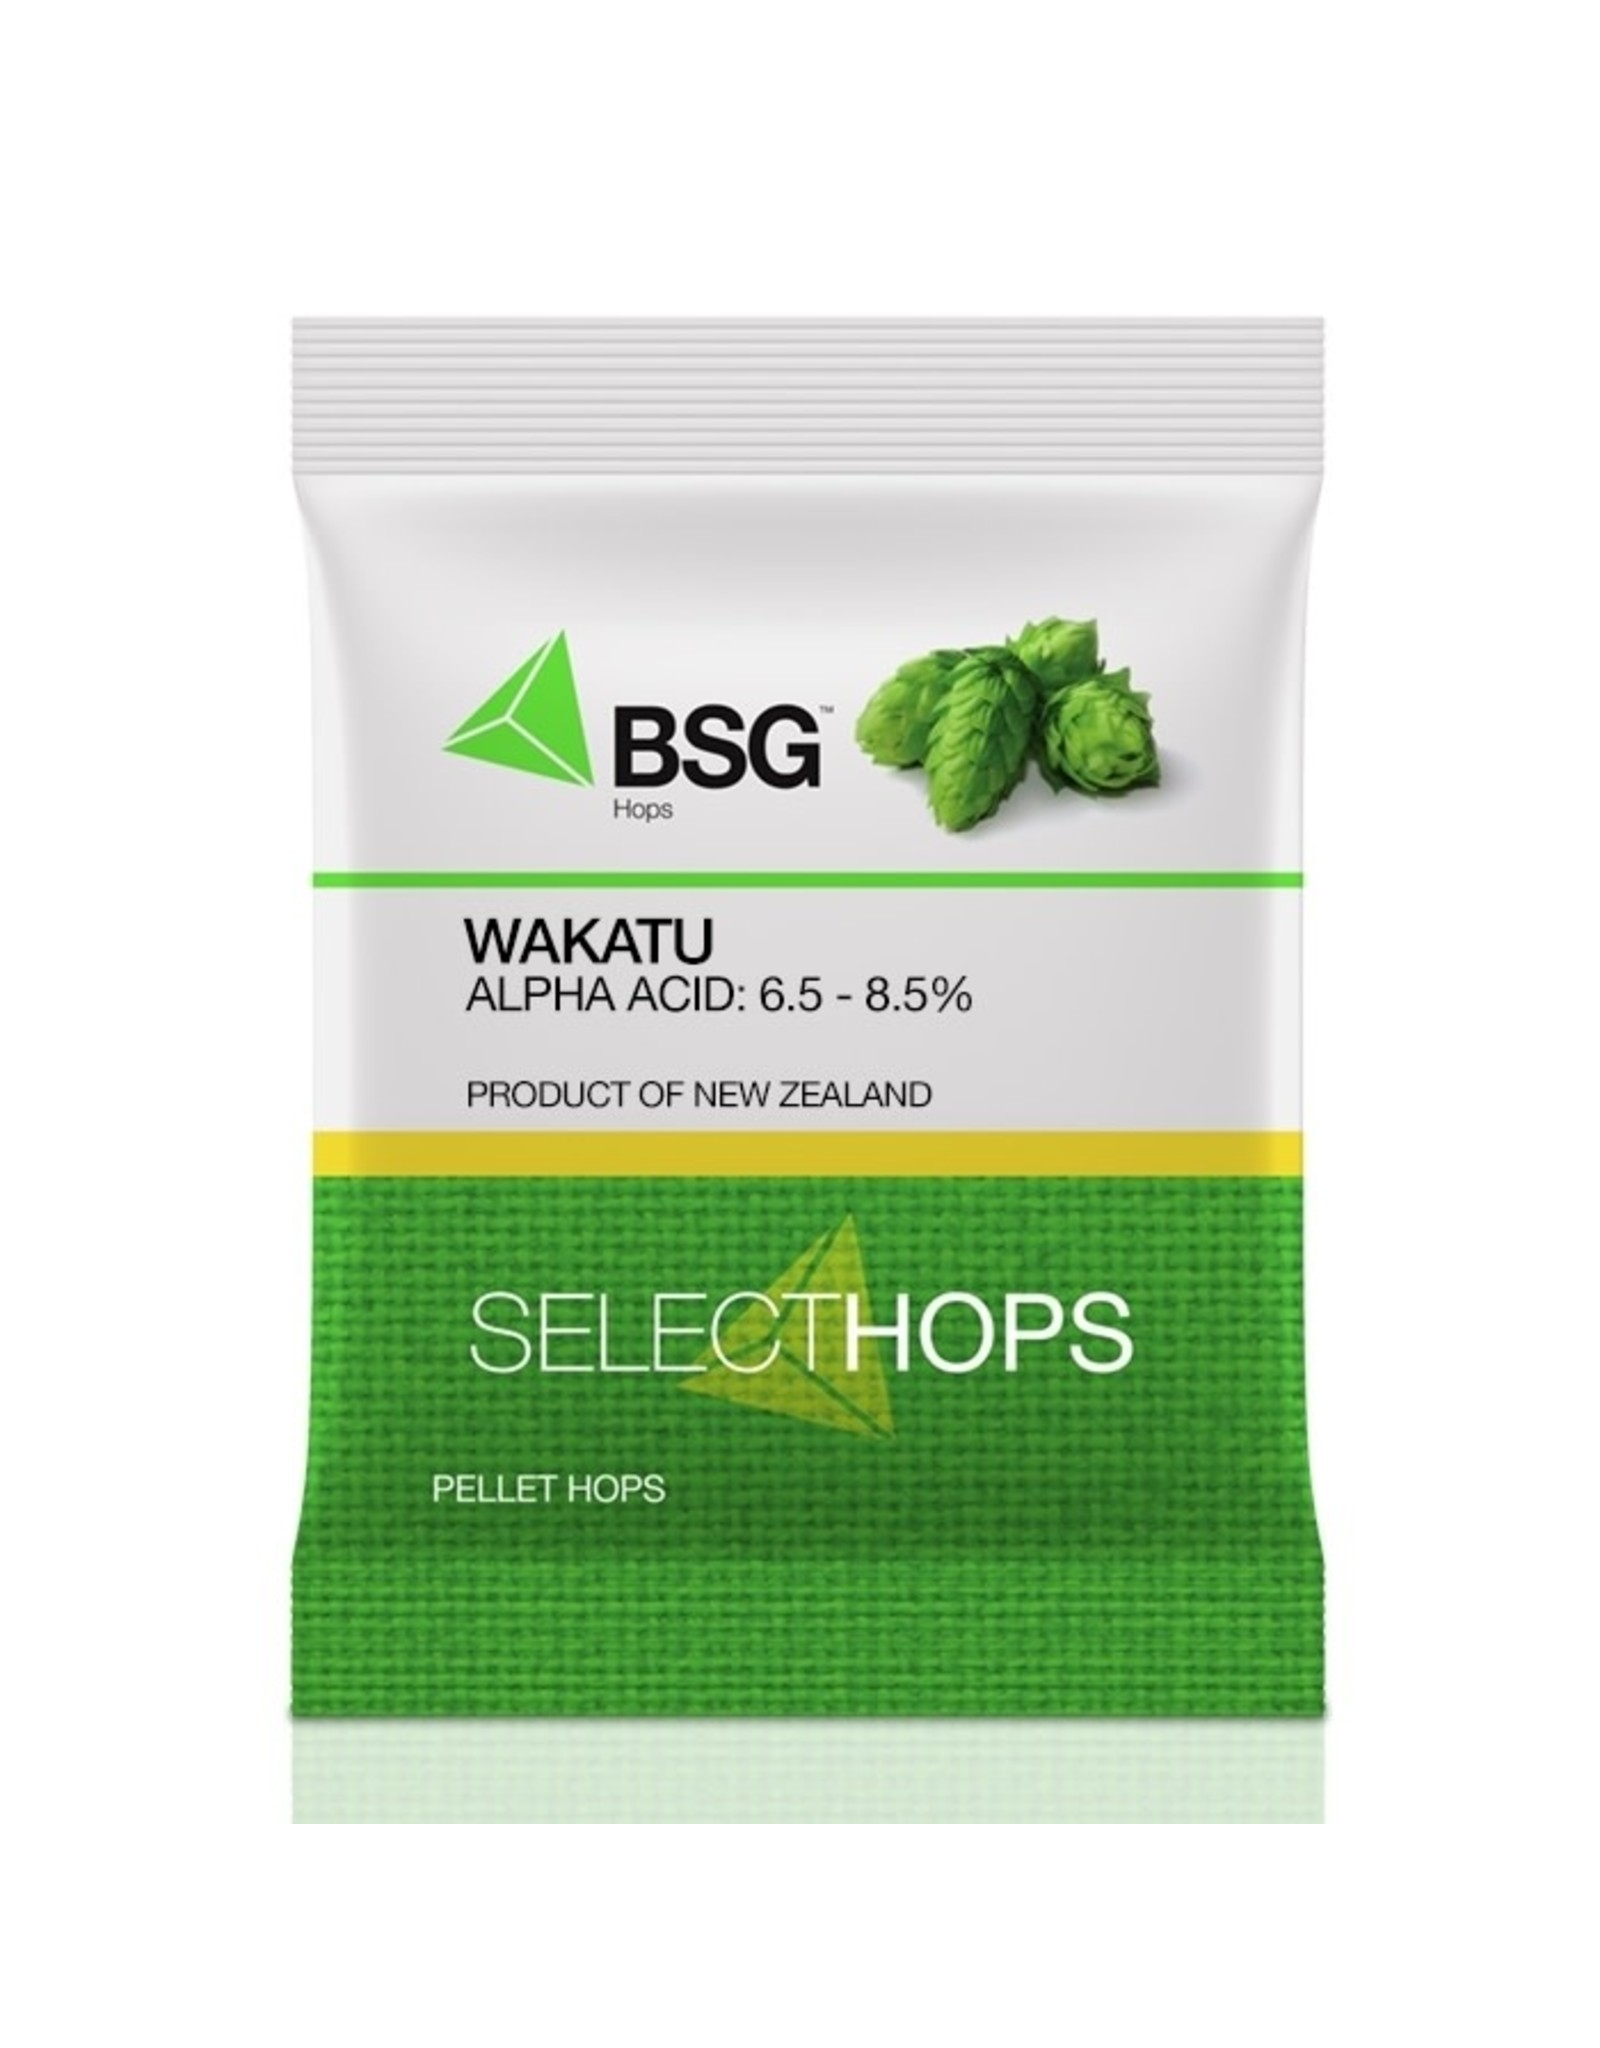 Wakatu (NZ) Pellet Hops 1oz